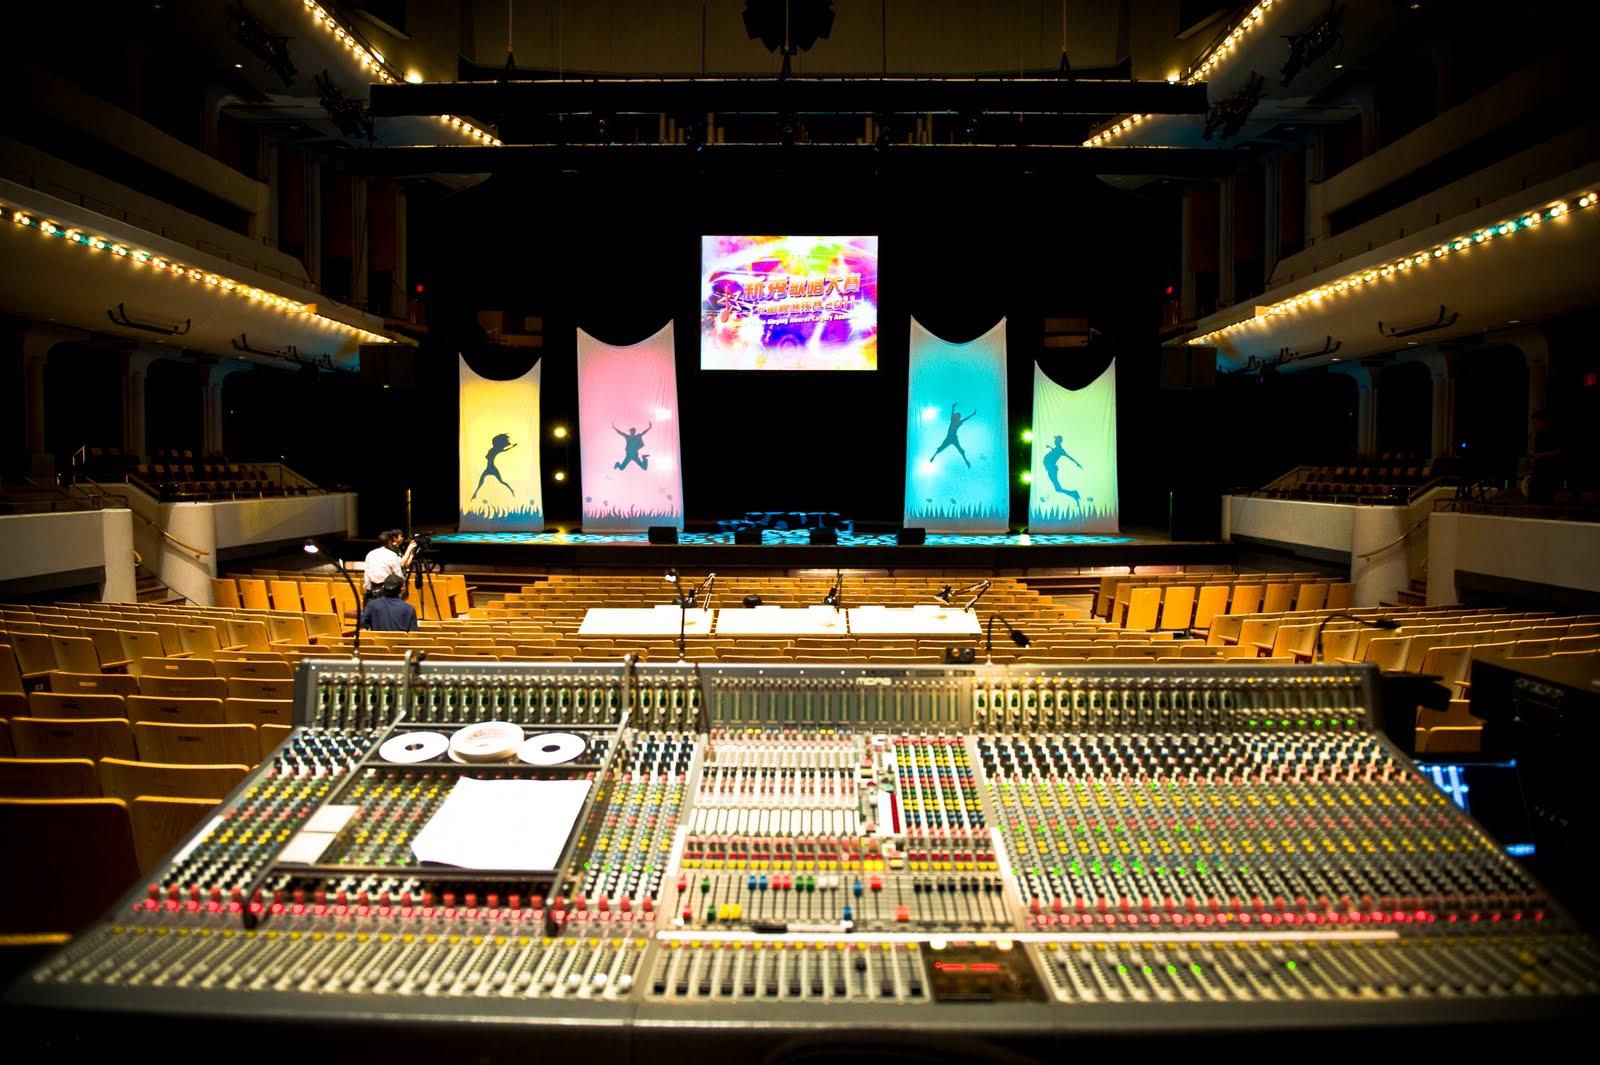 small concert stage design ideas - Concert Stage Design Ideas